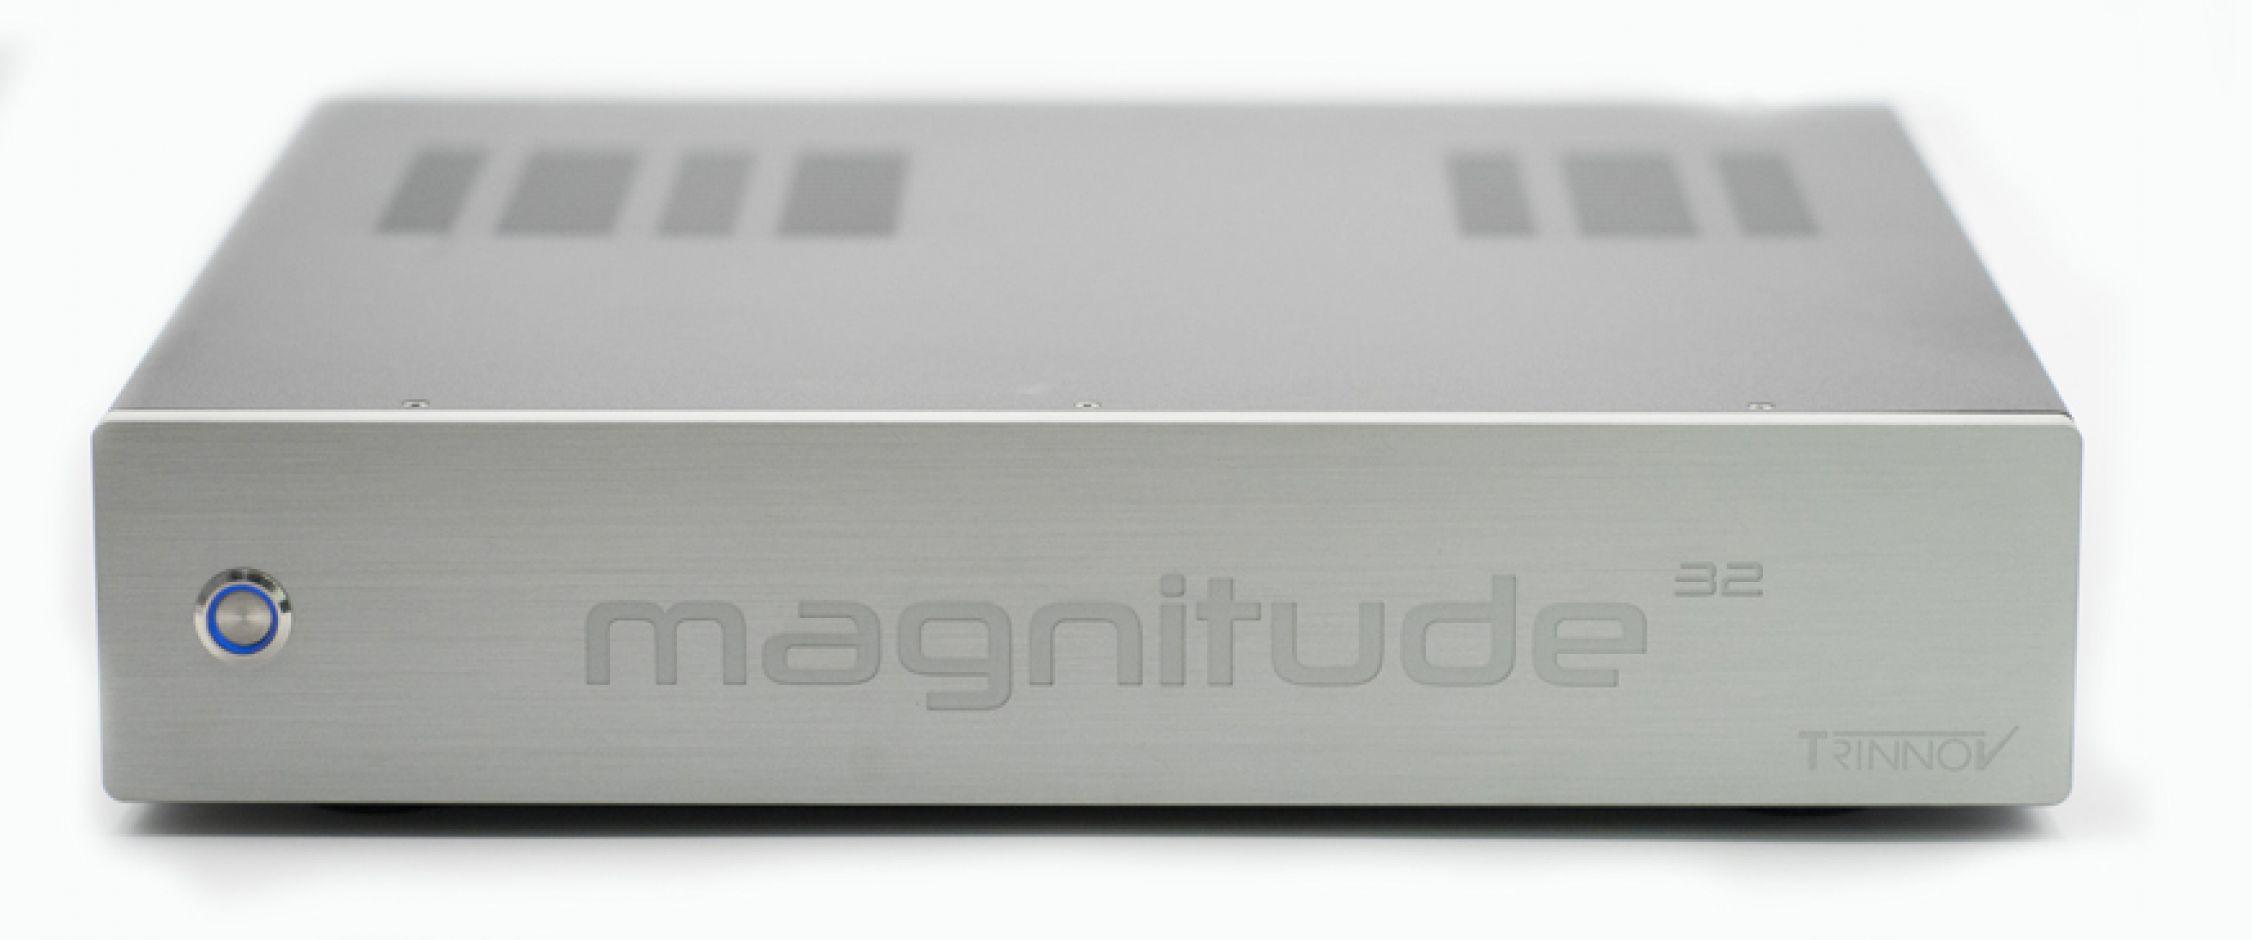 Magnitude32